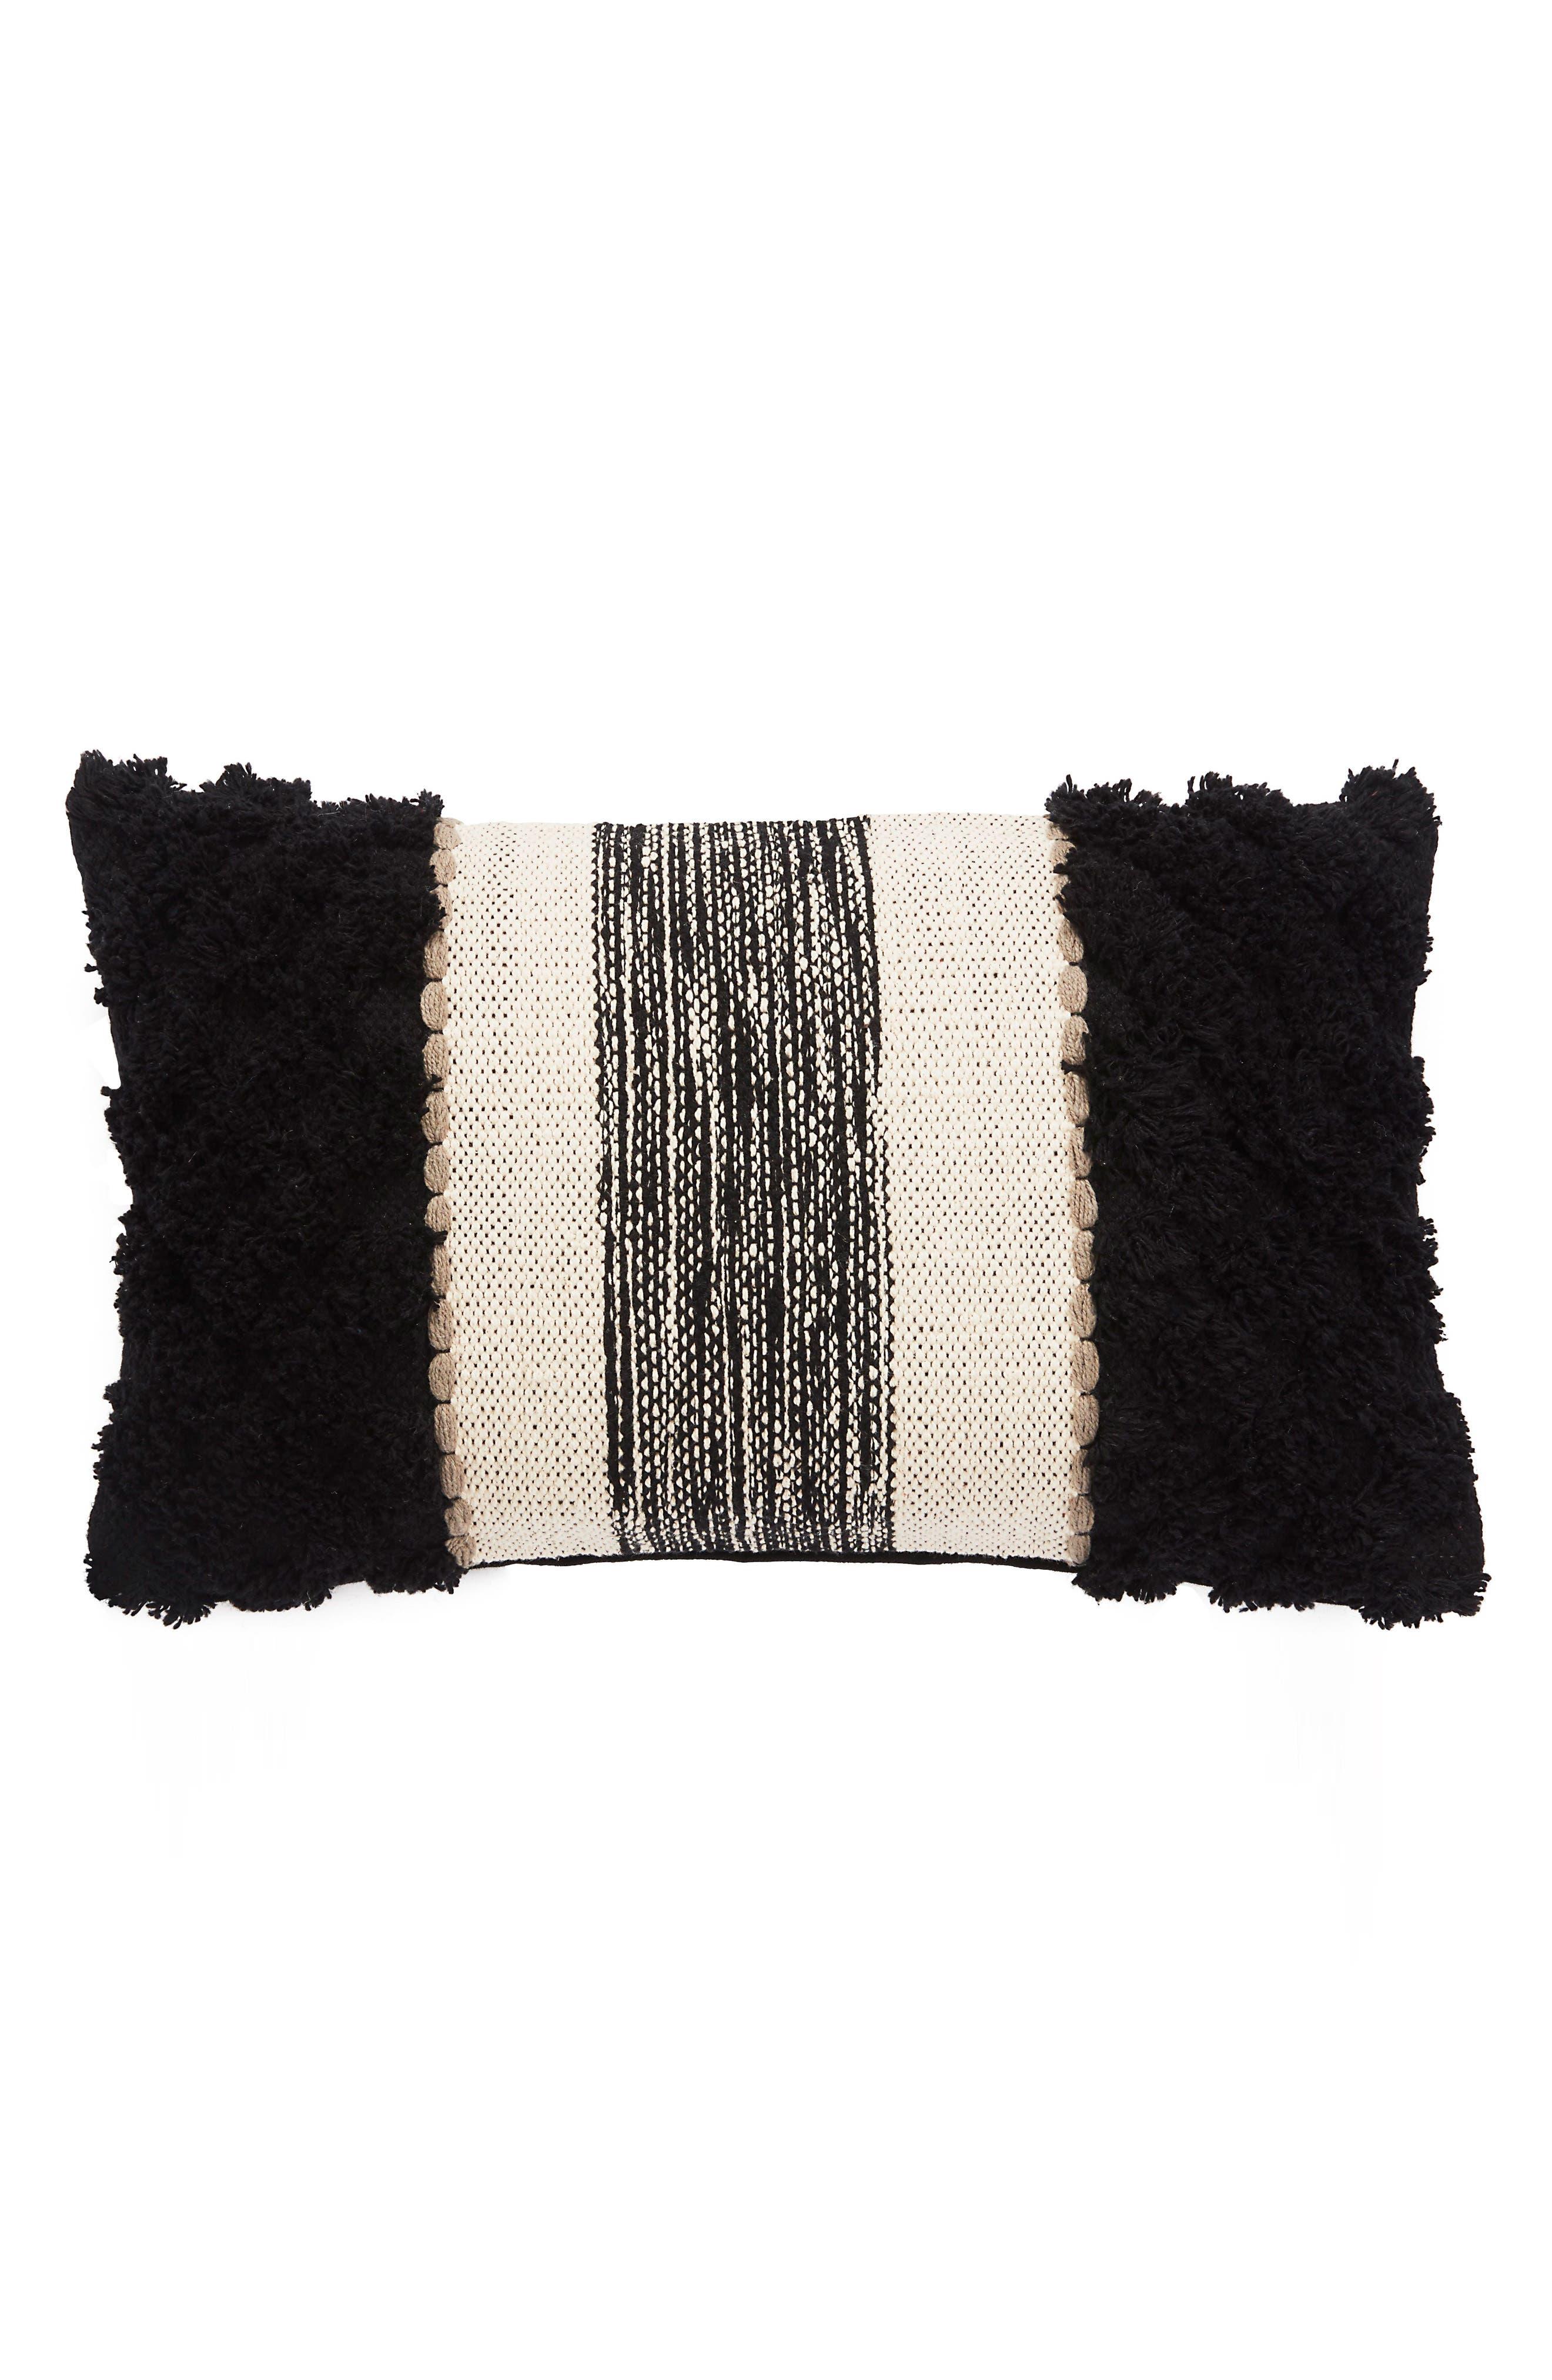 Accent Pillow,                             Main thumbnail 1, color,                             001